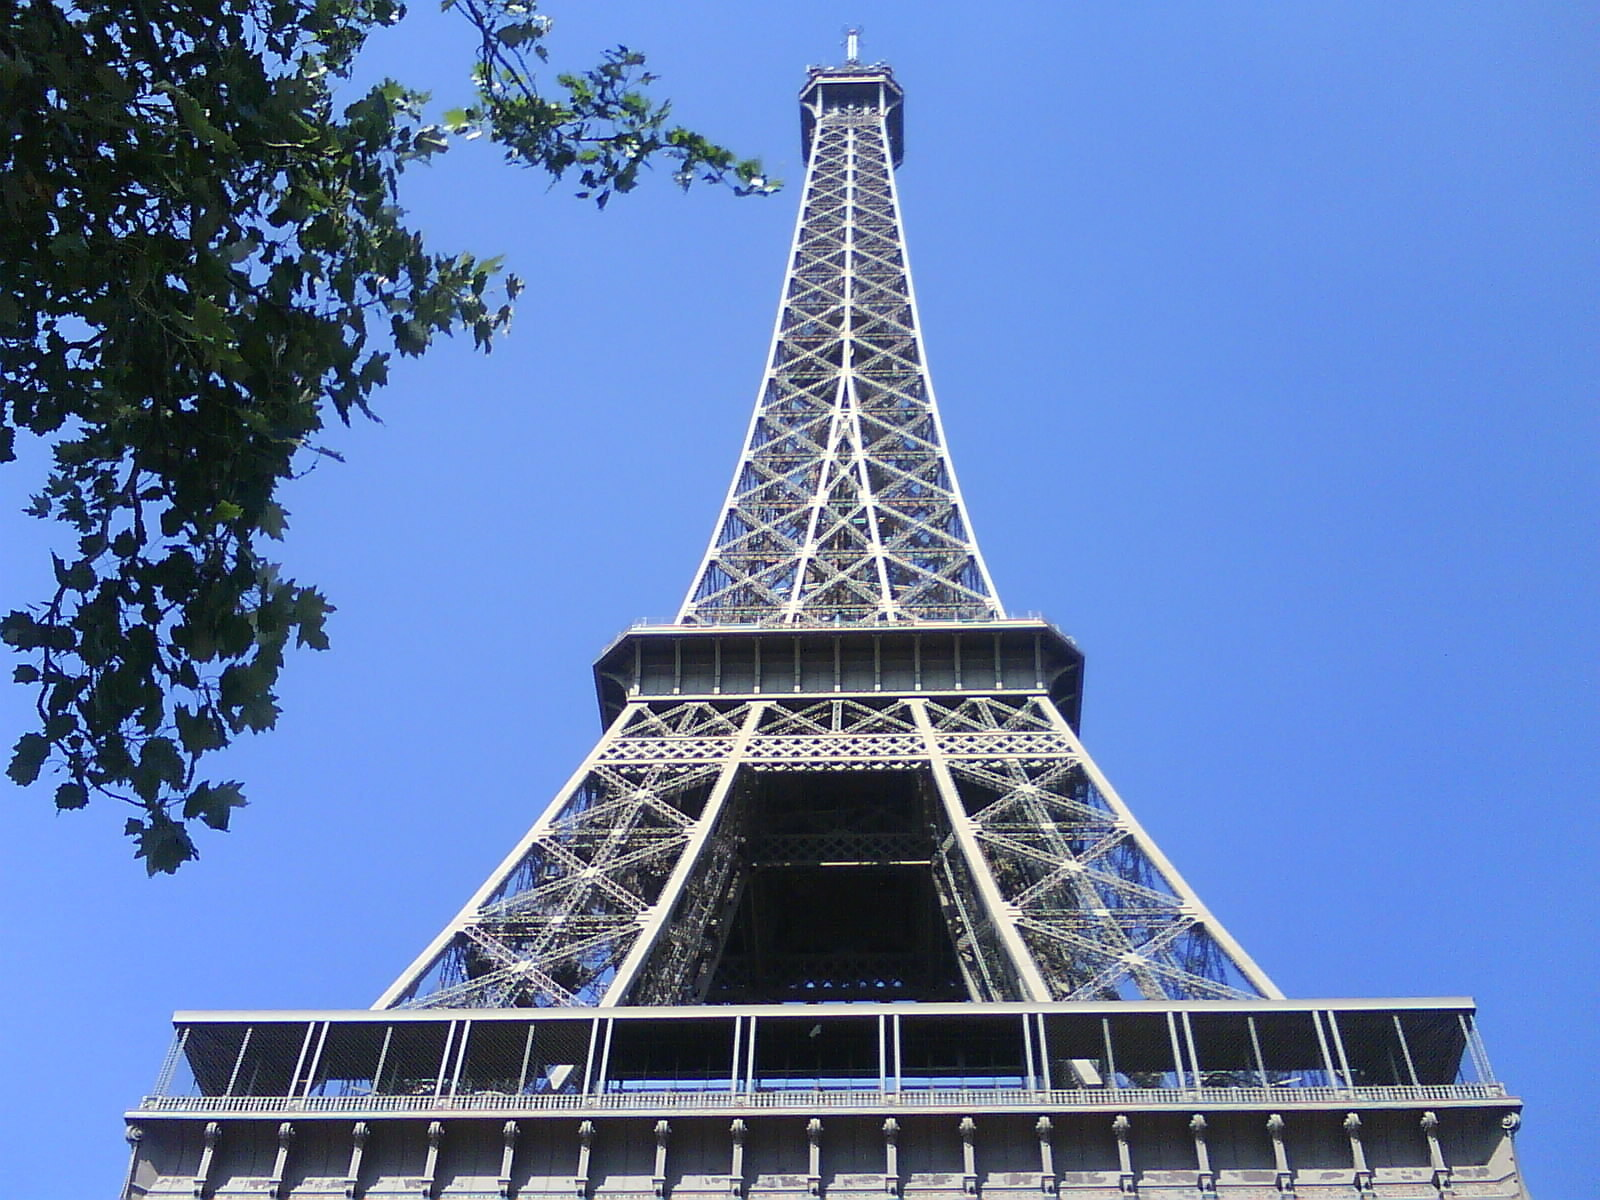 The Eiffel Tower - France Photo (3512988) - Fanpop